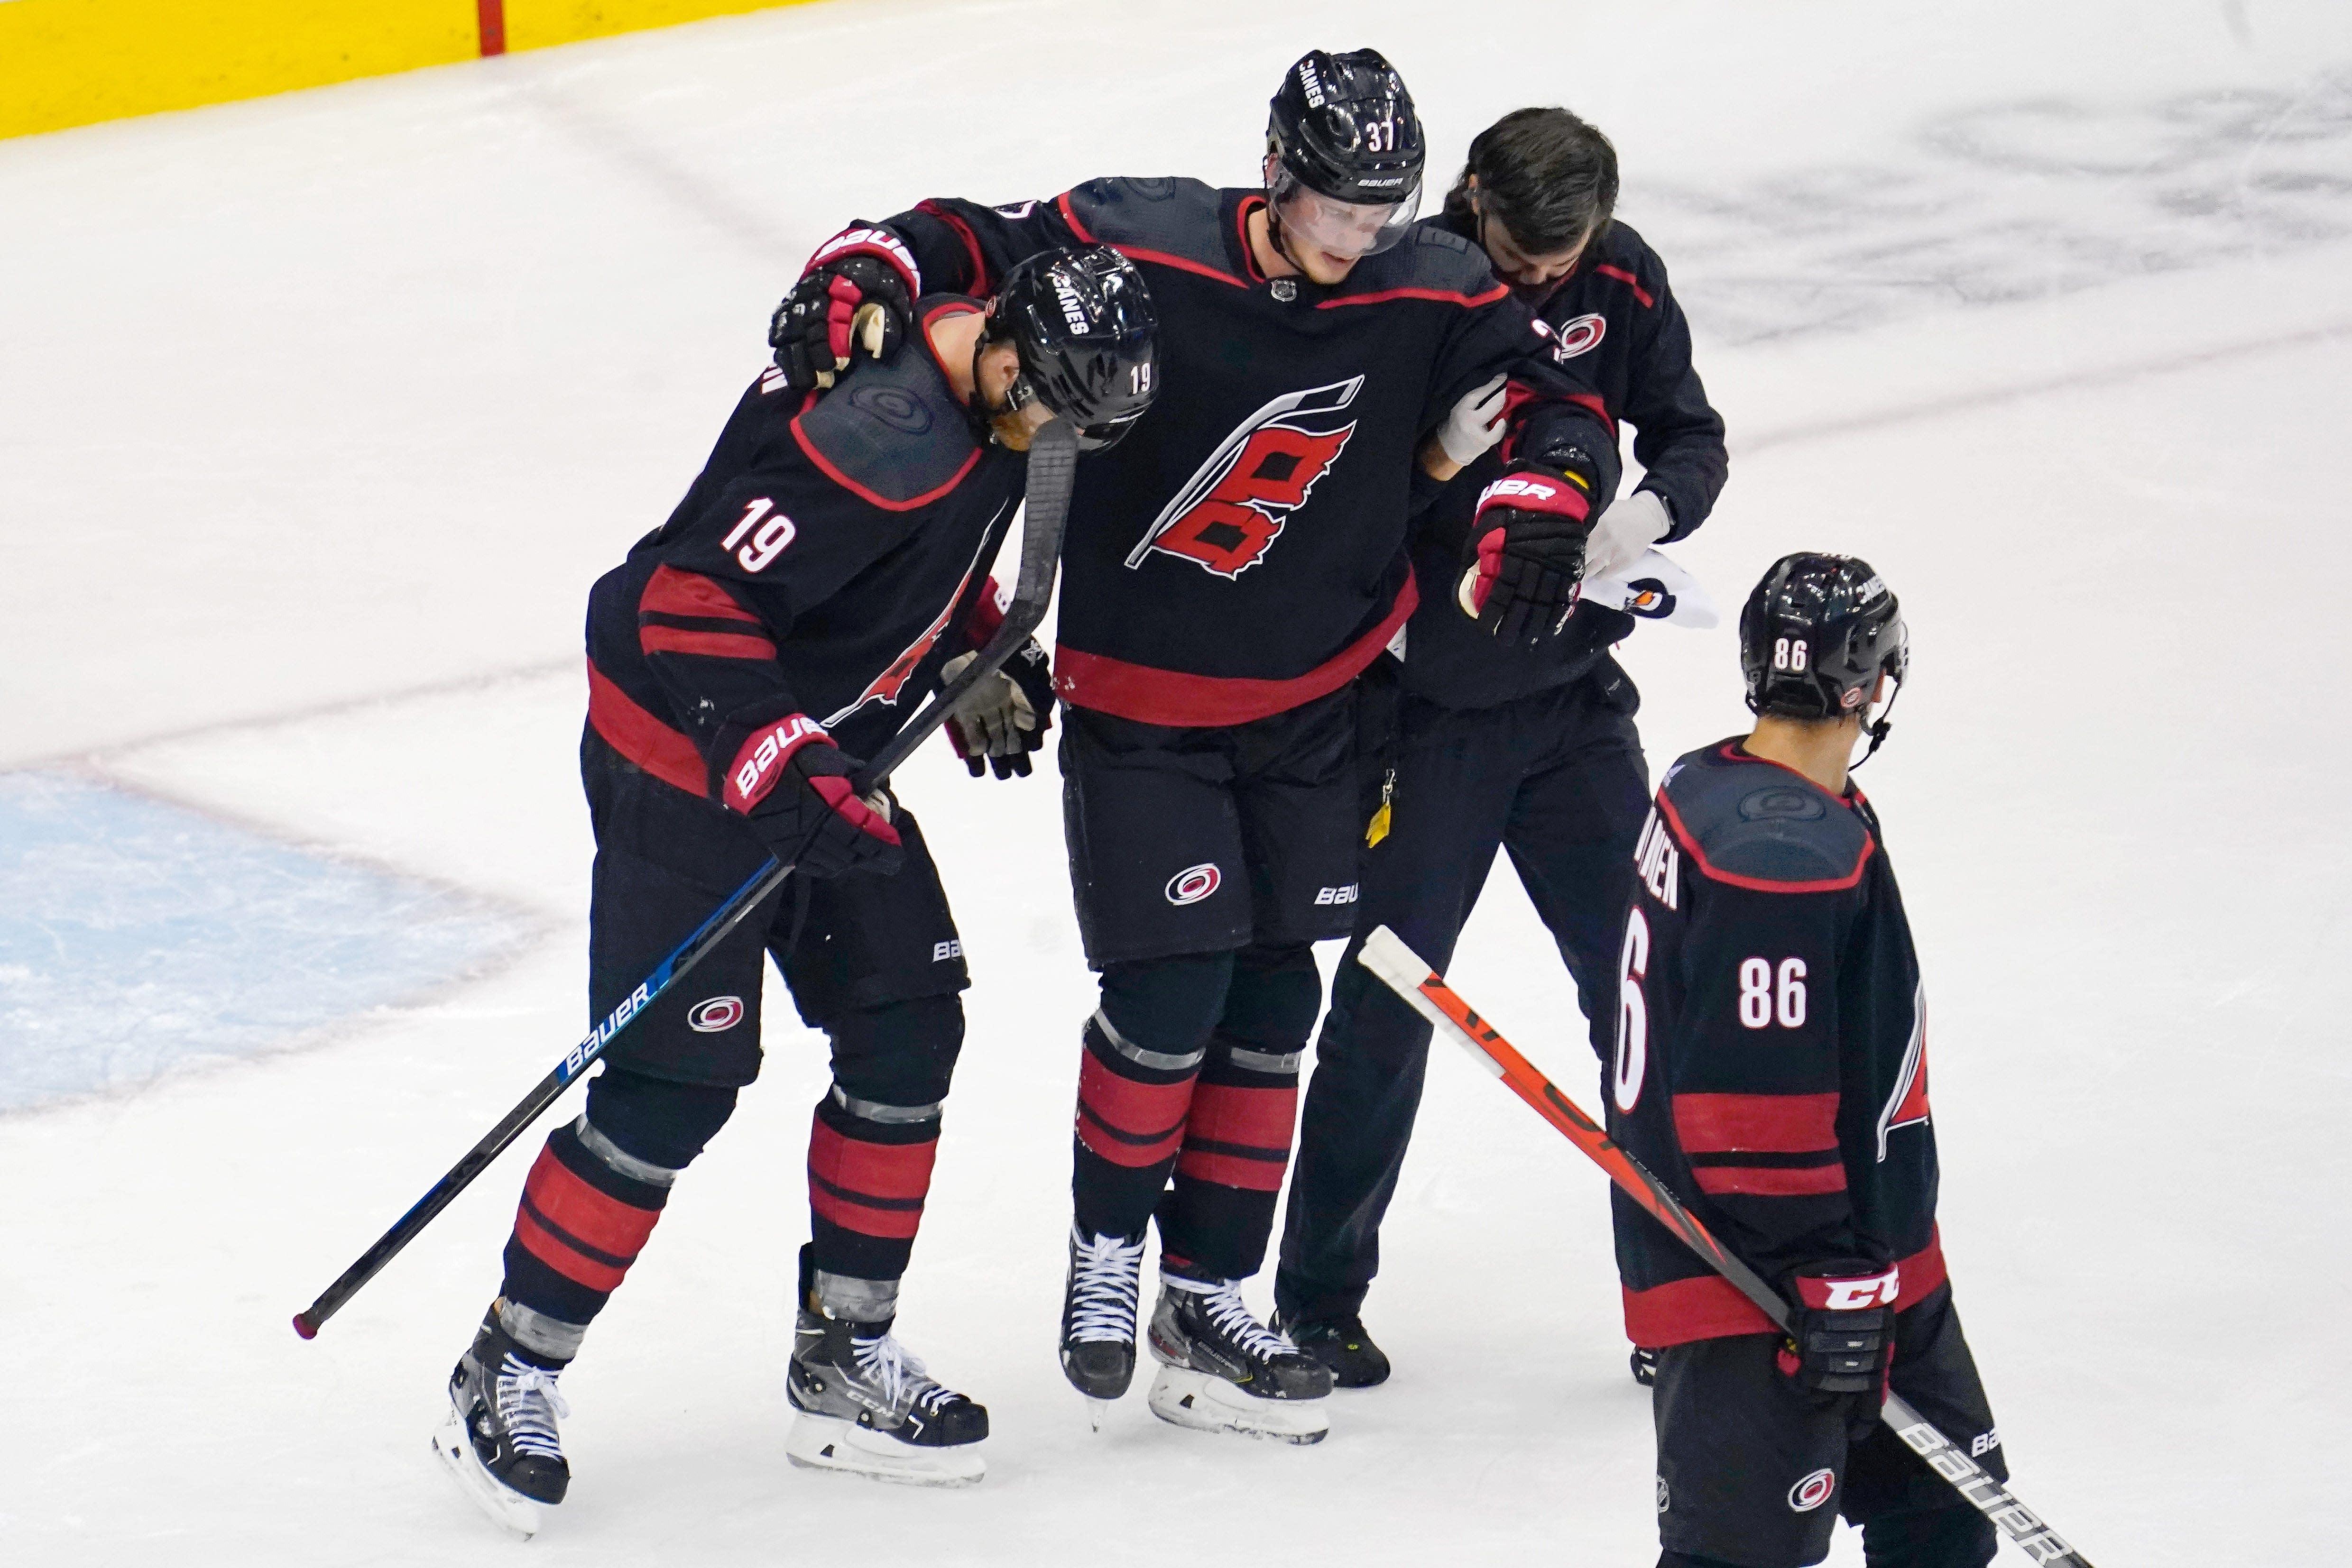 'You poke the bear:' Bruins announcer Jack Edwards' take on Andrei Svechnikov's injury draws criticism